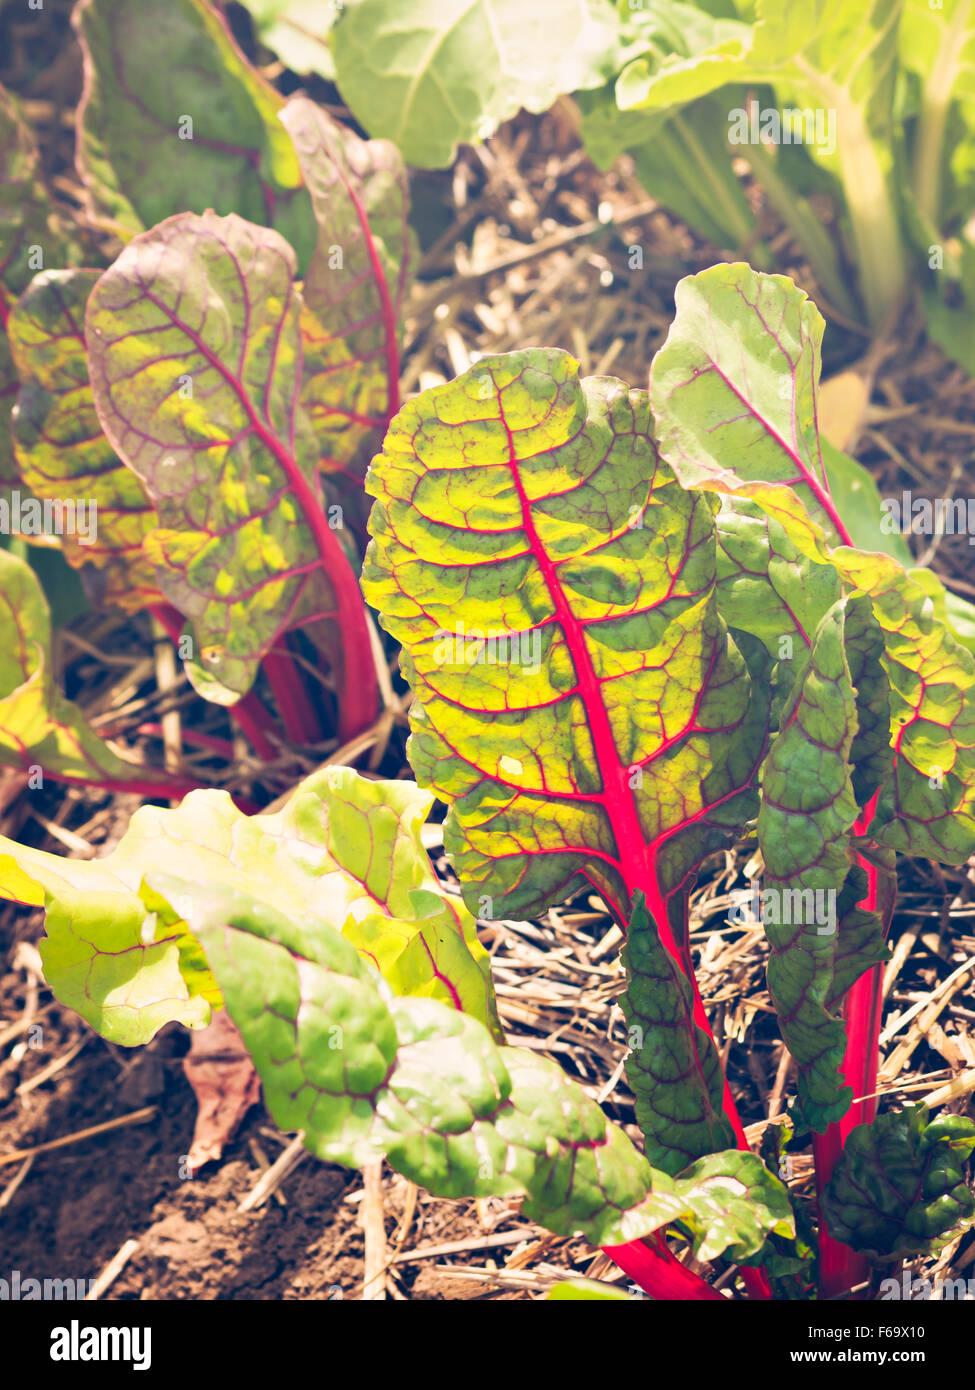 Organic vegetable garden on the far. - Stock Image